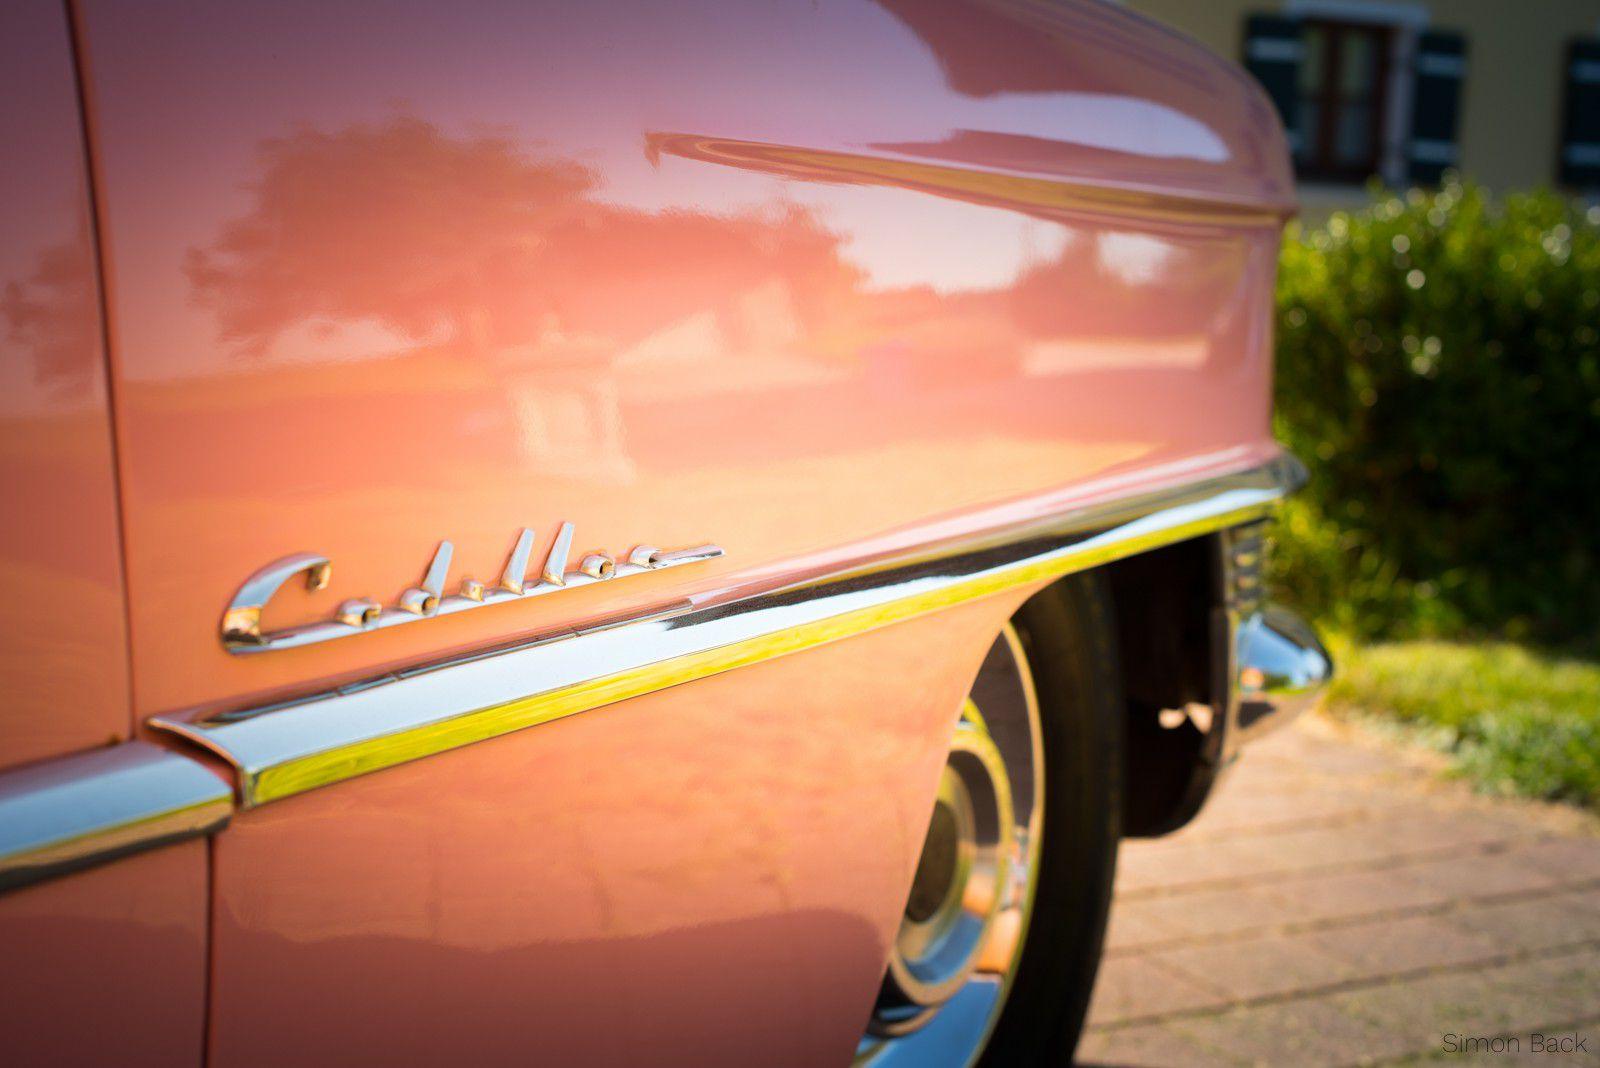 Cadillac Coupe DeVille - Der Cadillac Schriftzug